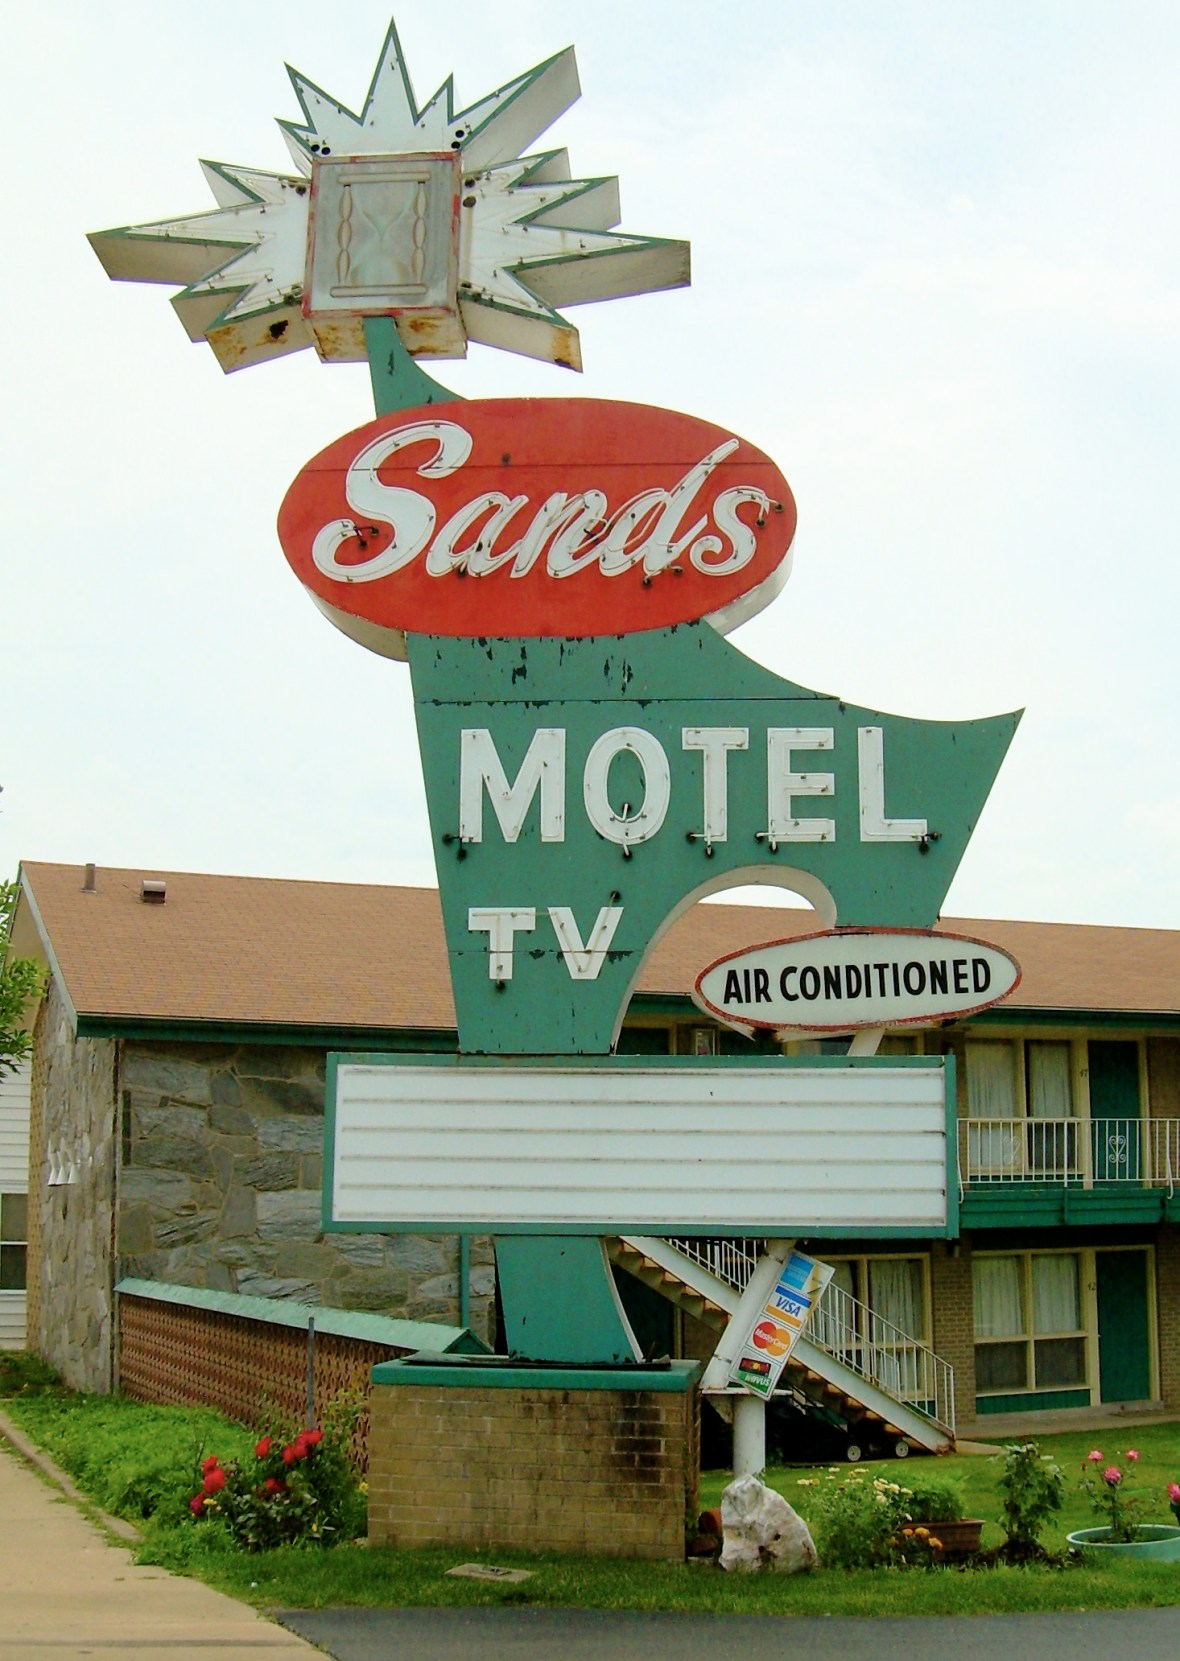 Sands Motel - 1215 La Salle Street, Ottawa, Illinois U.S.A. - June 14, 2009